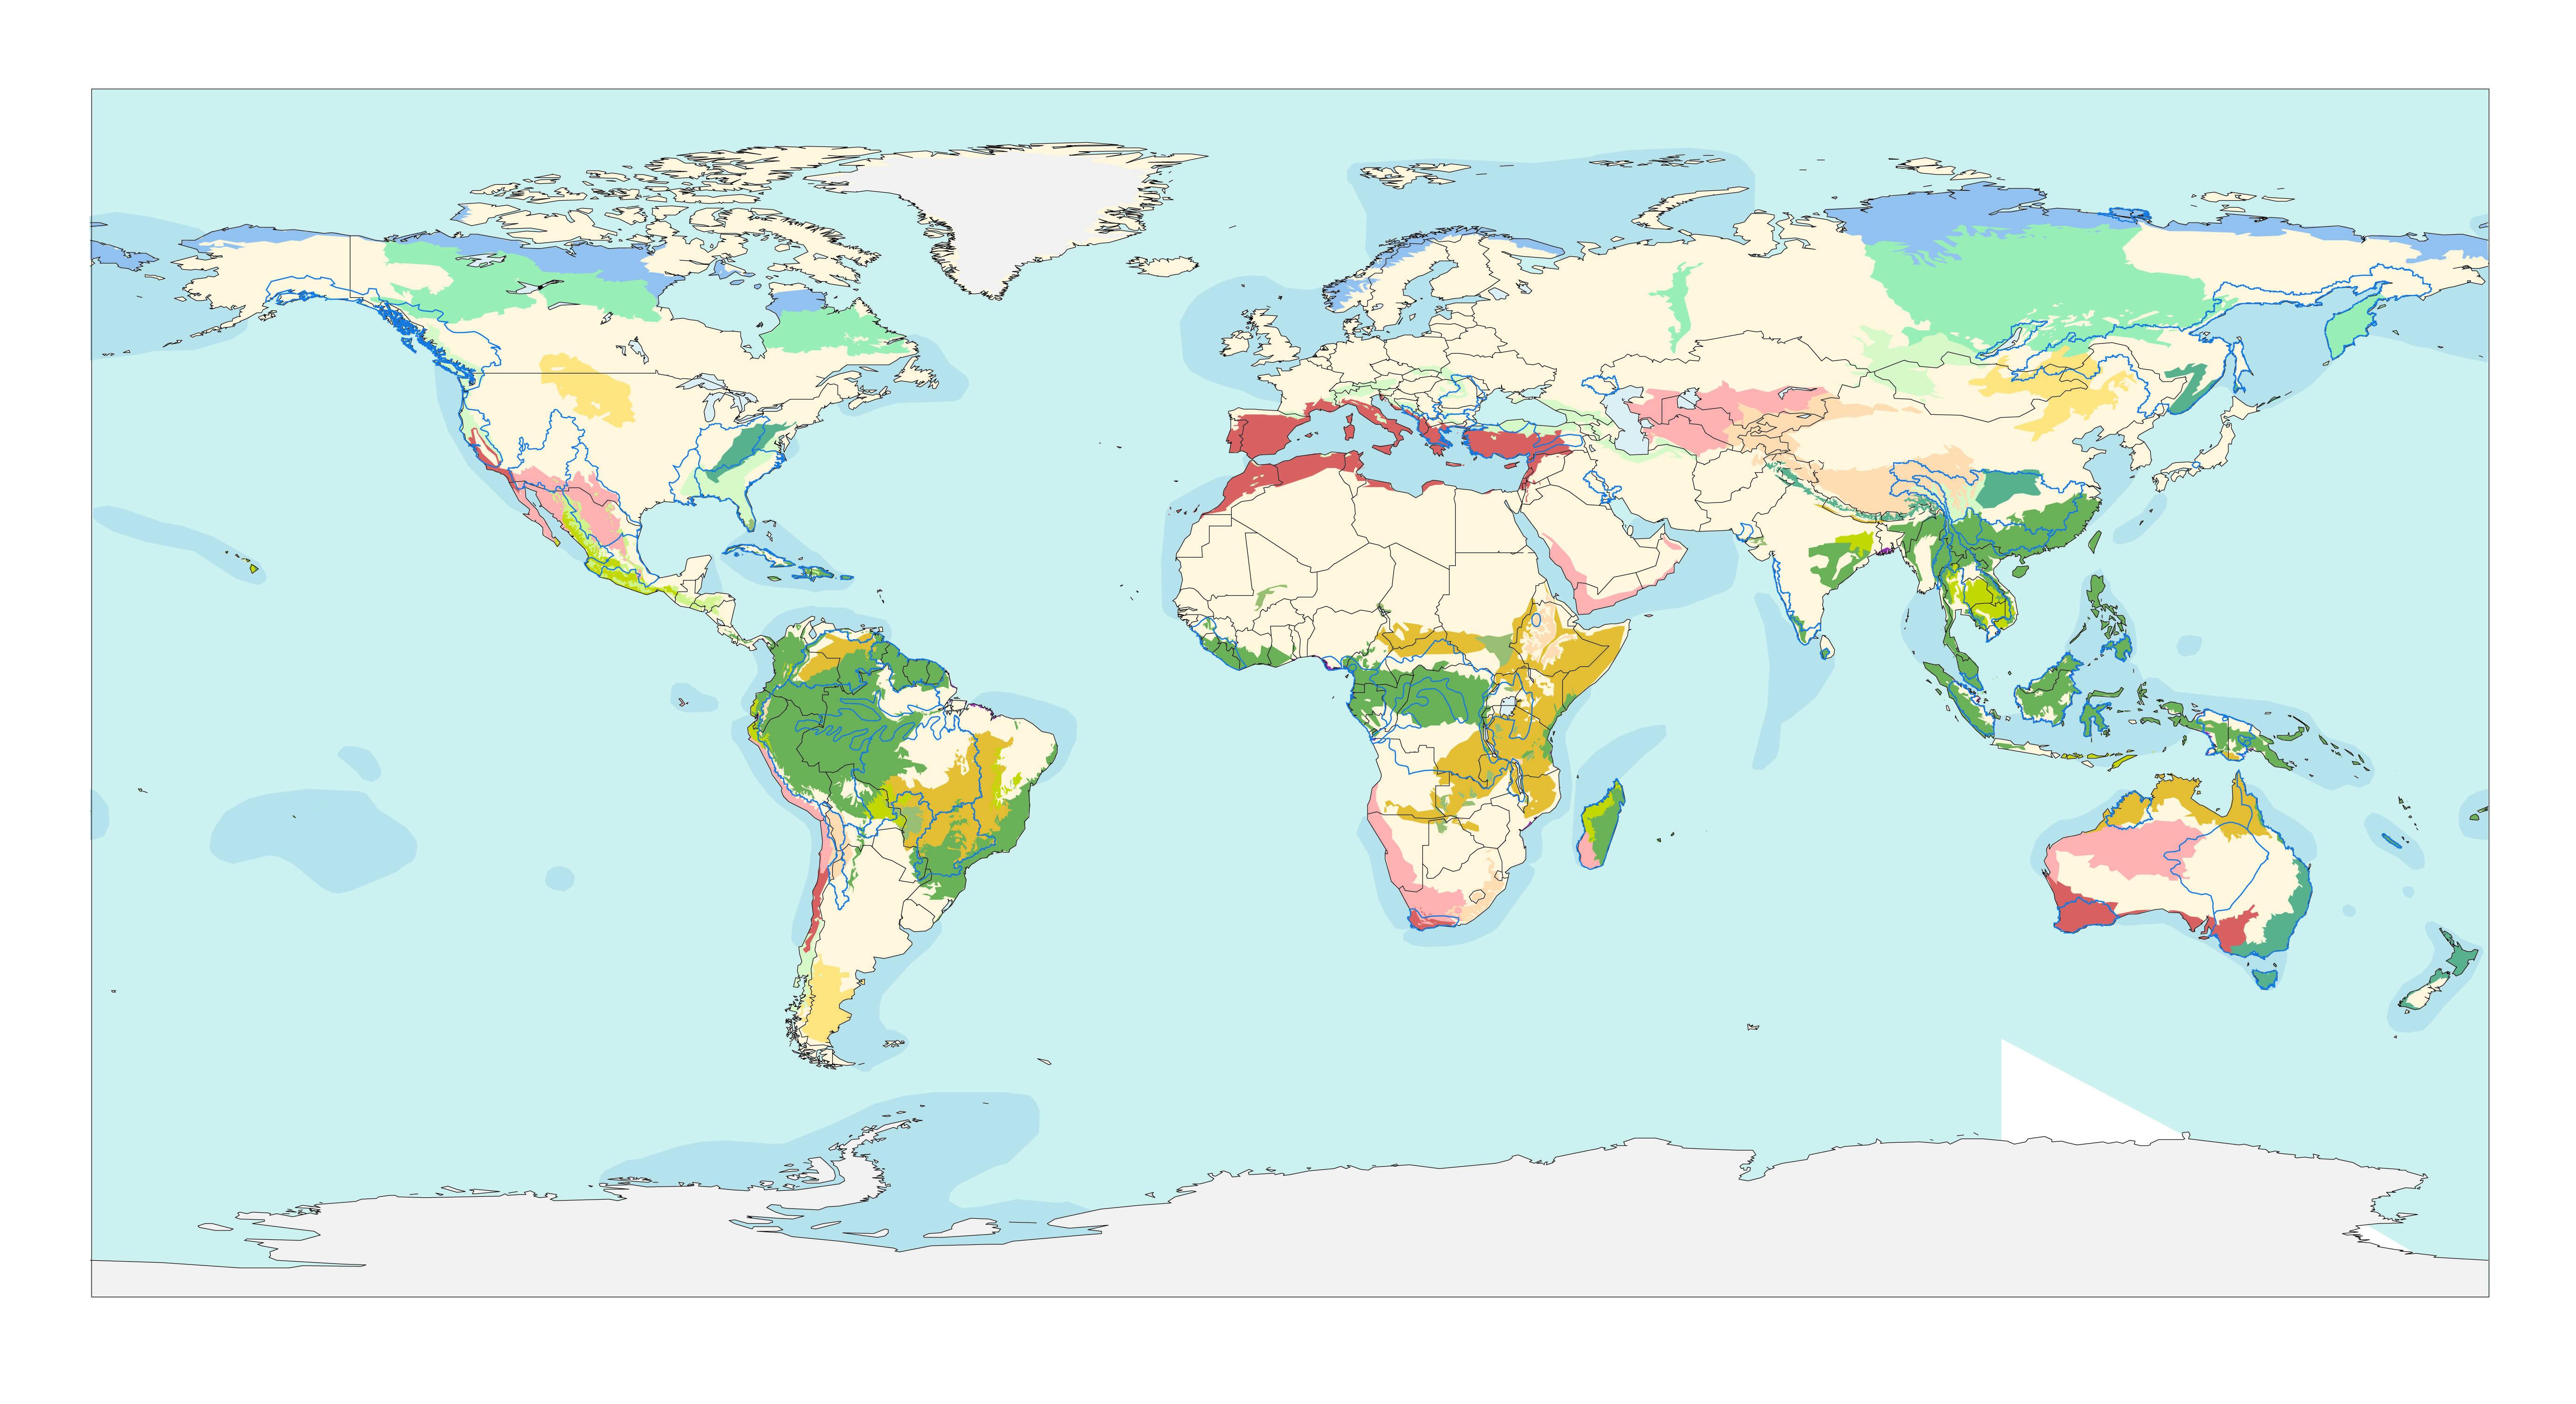 Ecorregiones del mundo